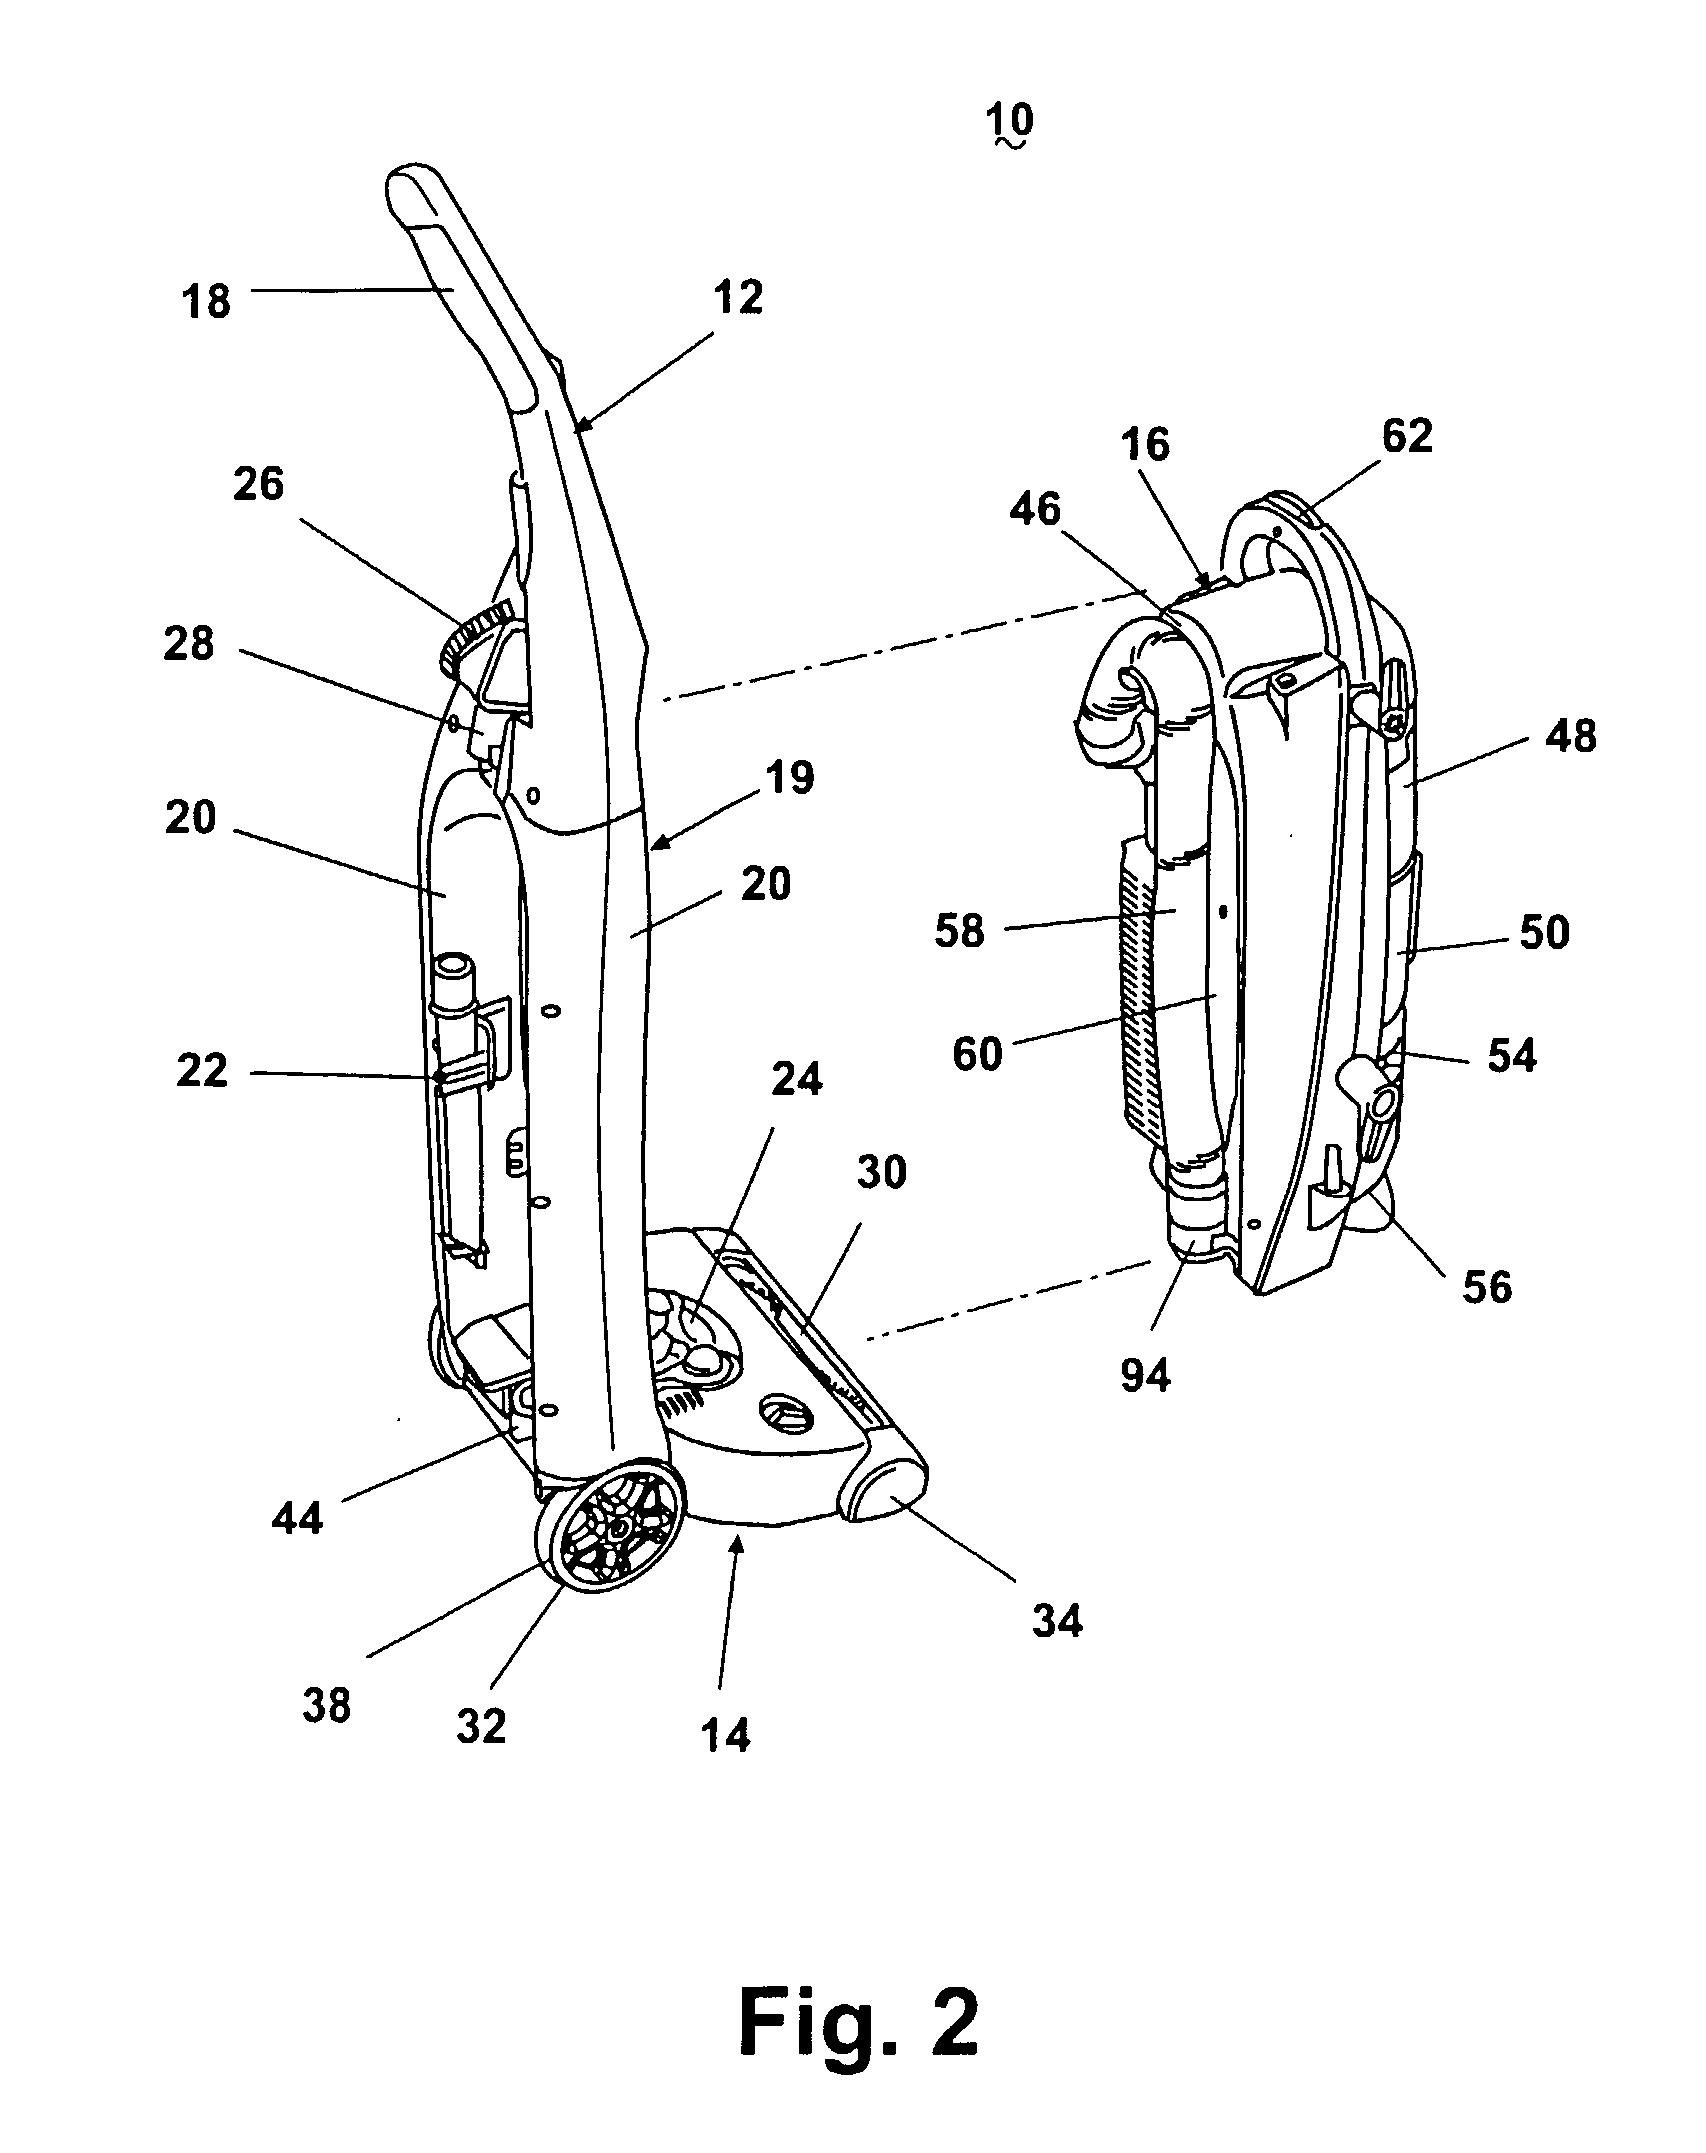 baracuda pool cleaner parts diagram polaris wiring vacuum hose by the foot imageresizertool com